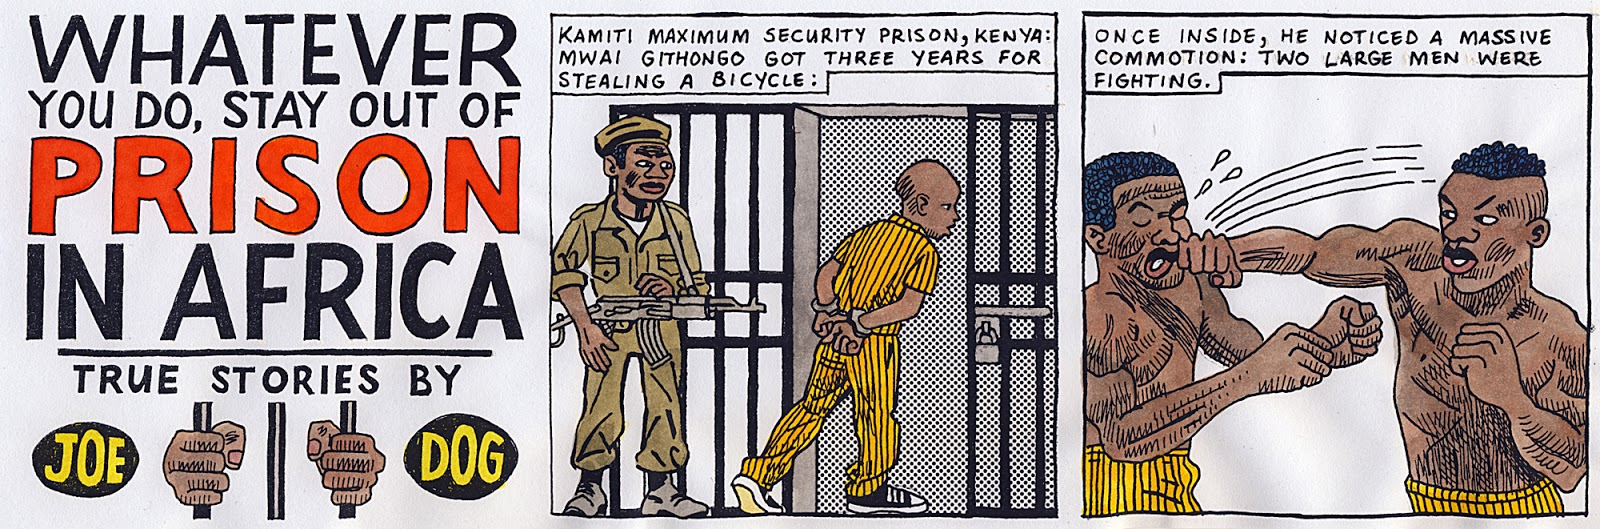 Erotic prison rape stories